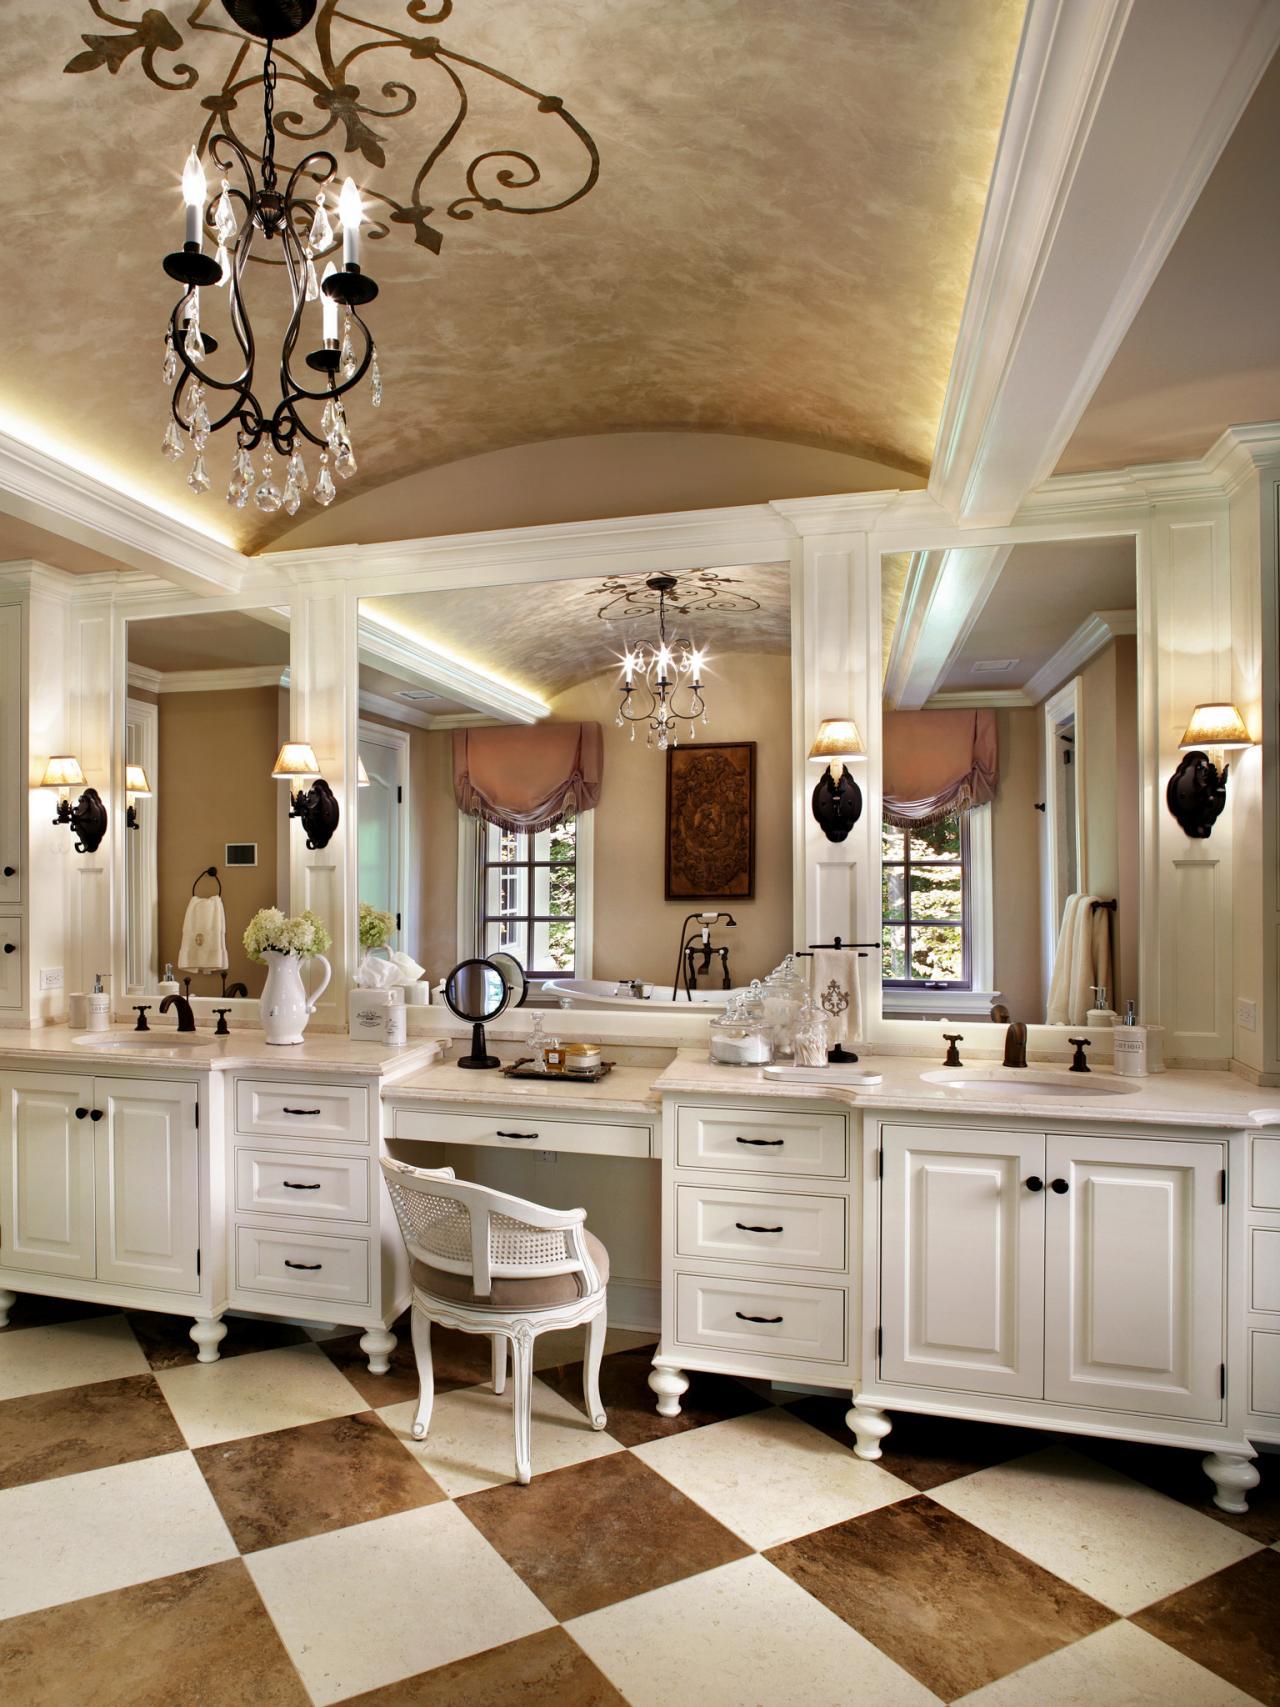 Charming-and-ravishing-checkered-floors